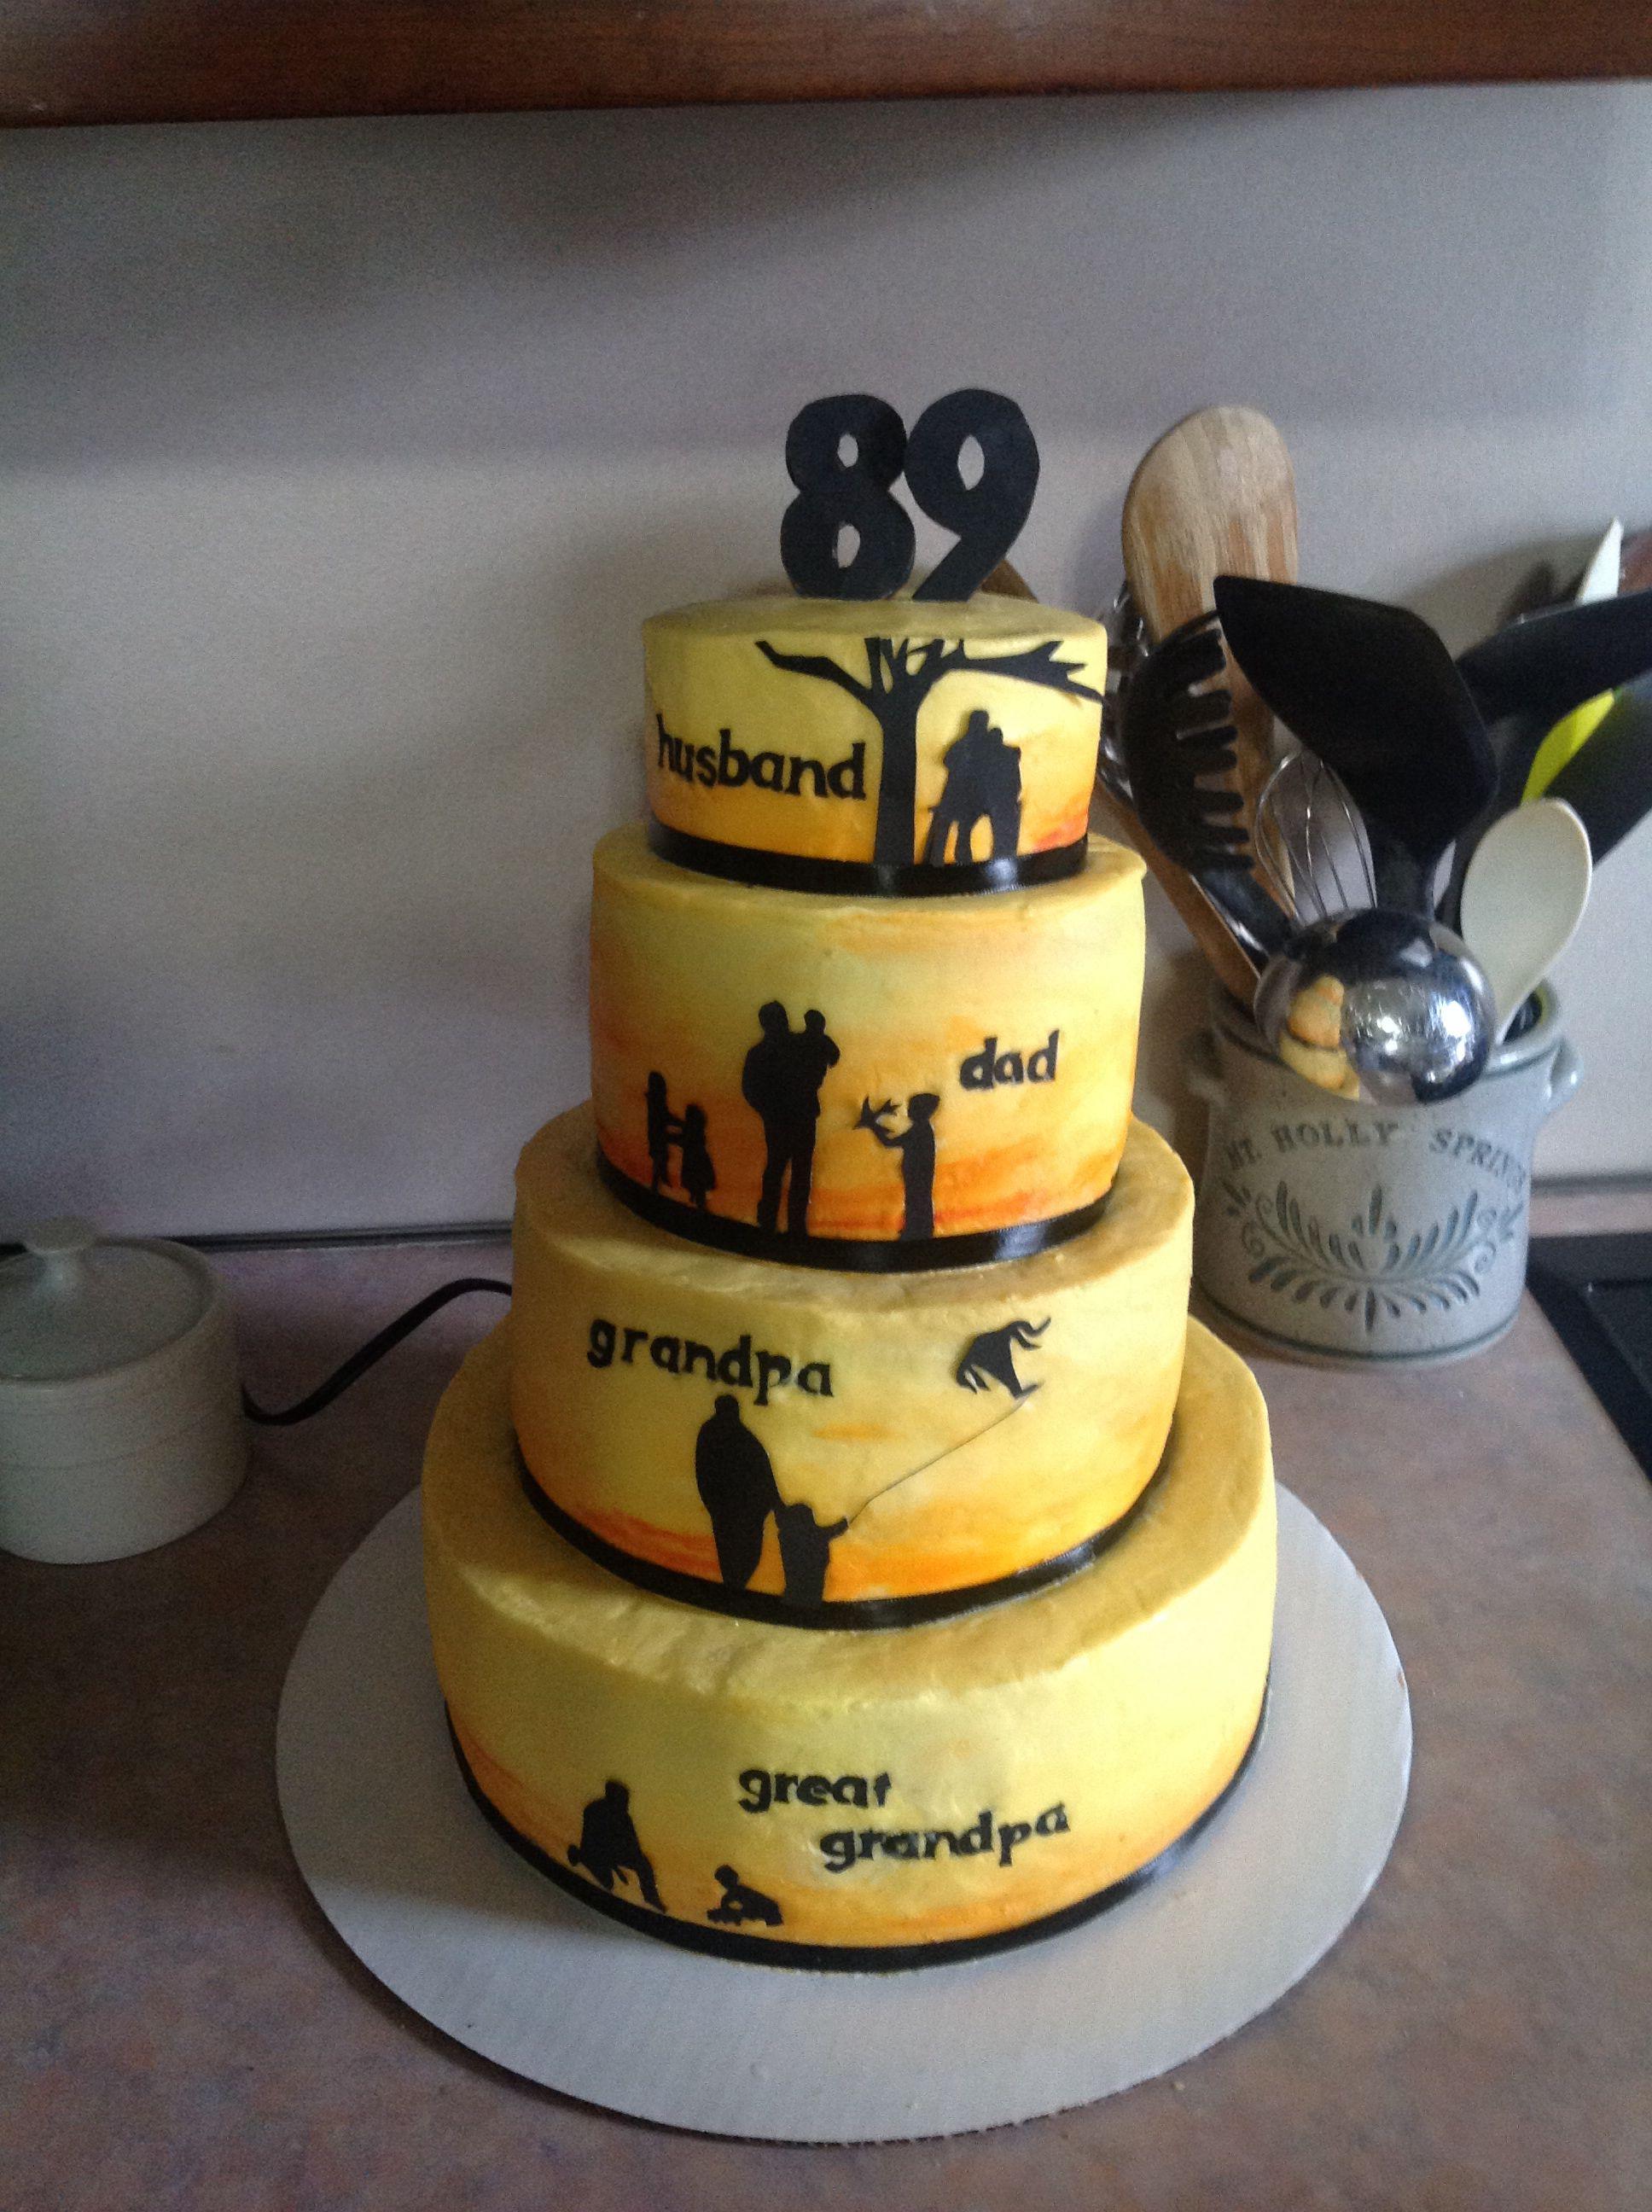 Birthday cake for grandpa desserts cake food